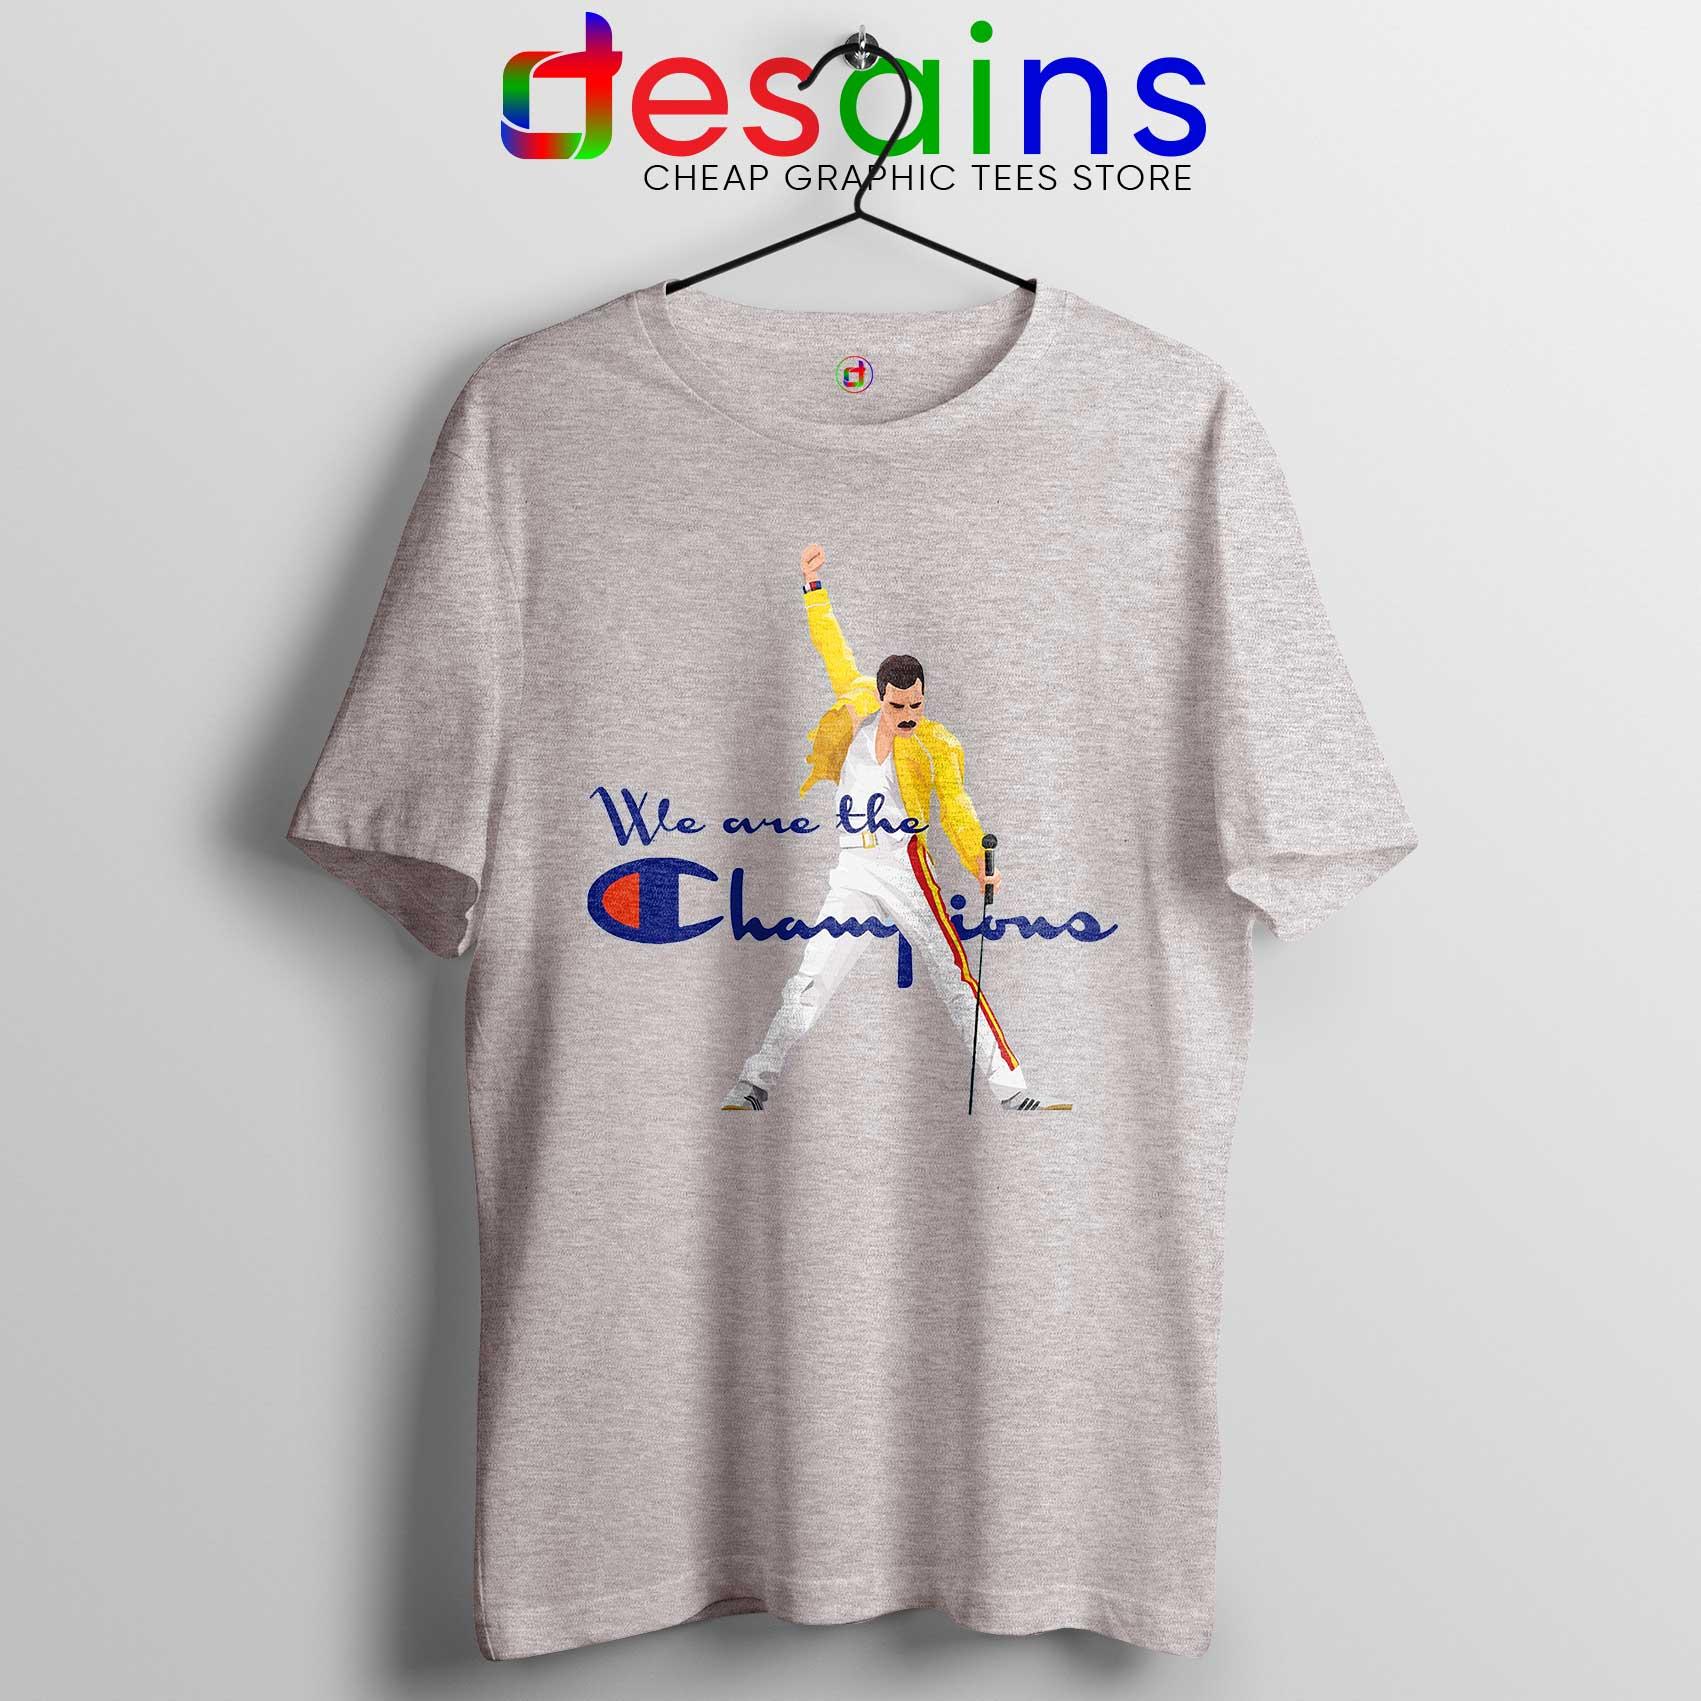 df0d64c6d4eb Cheap Tee Shirt Freddie Champion Tshirt Sport Grey We are the Champion